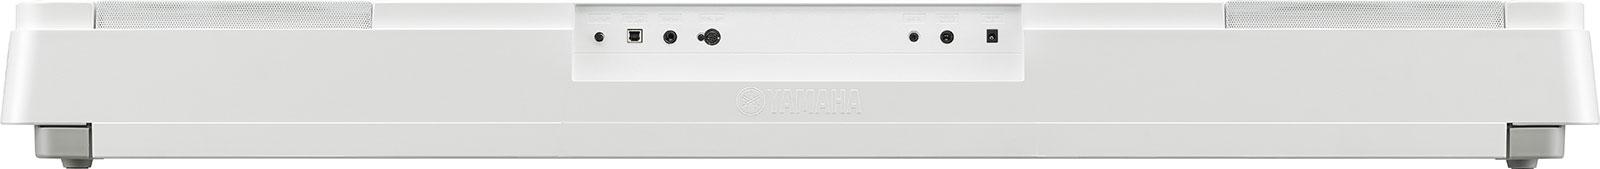 yamaha dgx 650. dgx-650 portable grand with 88 weighted keys yamaha dgx 650 e